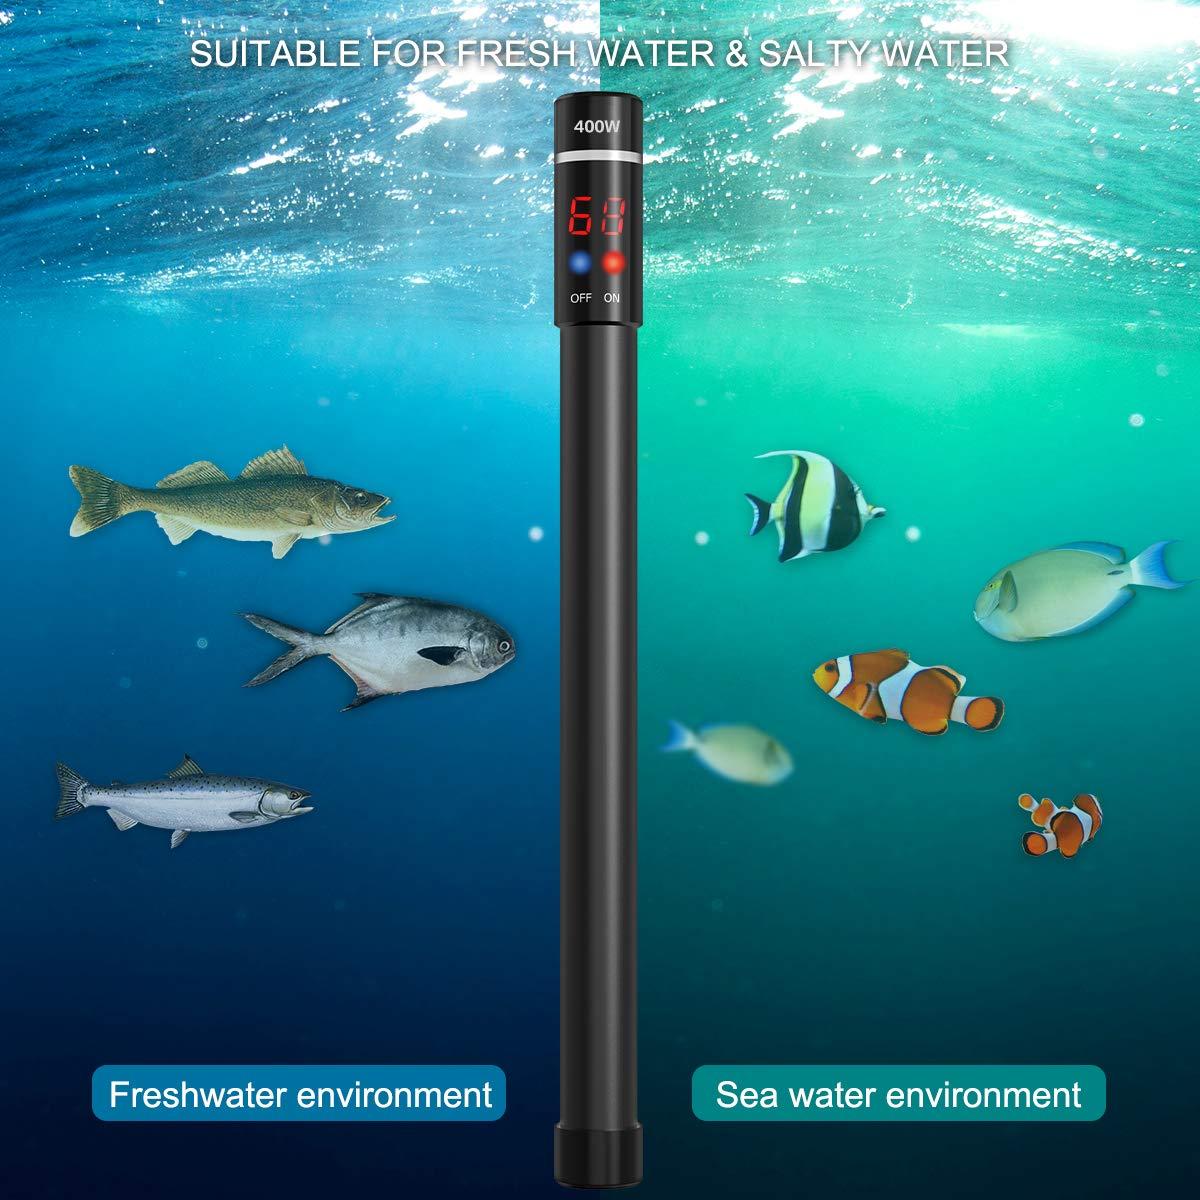 UEETEK Aquarium Heater 400W, Submersible Titanium Fish Tank Heaters Thermostat with Intelligent LED Temperature Display by UEETEK (Image #8)